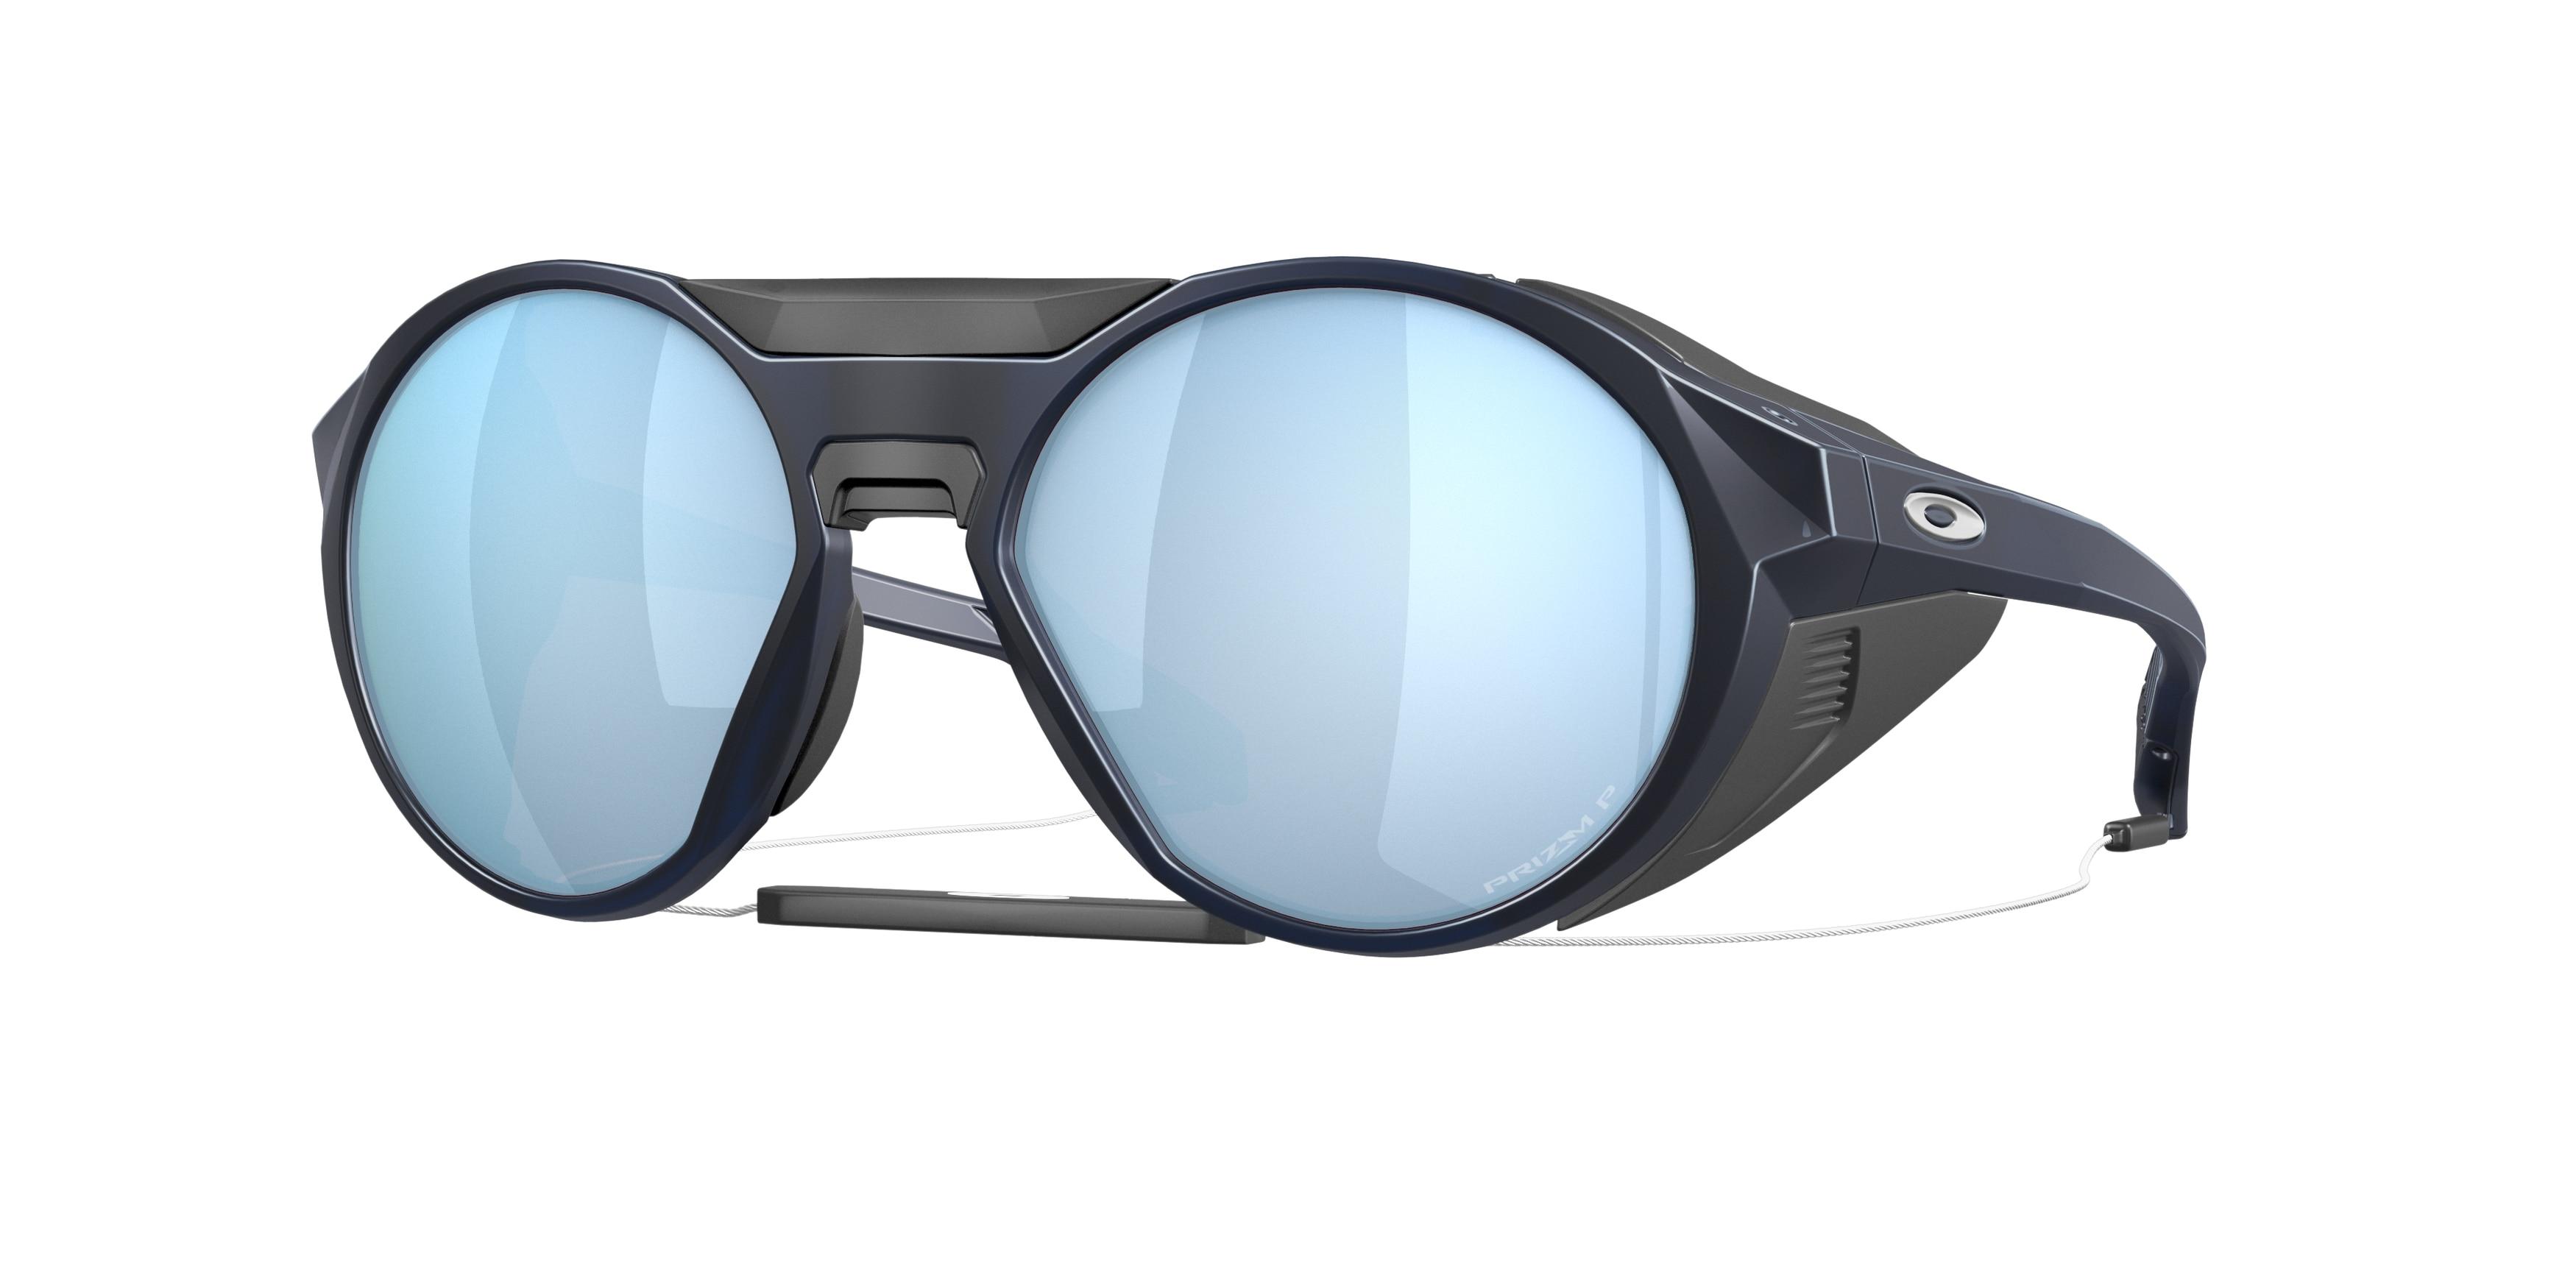 oakley_0oo9440_944005_matte_translucent_blue_polarized